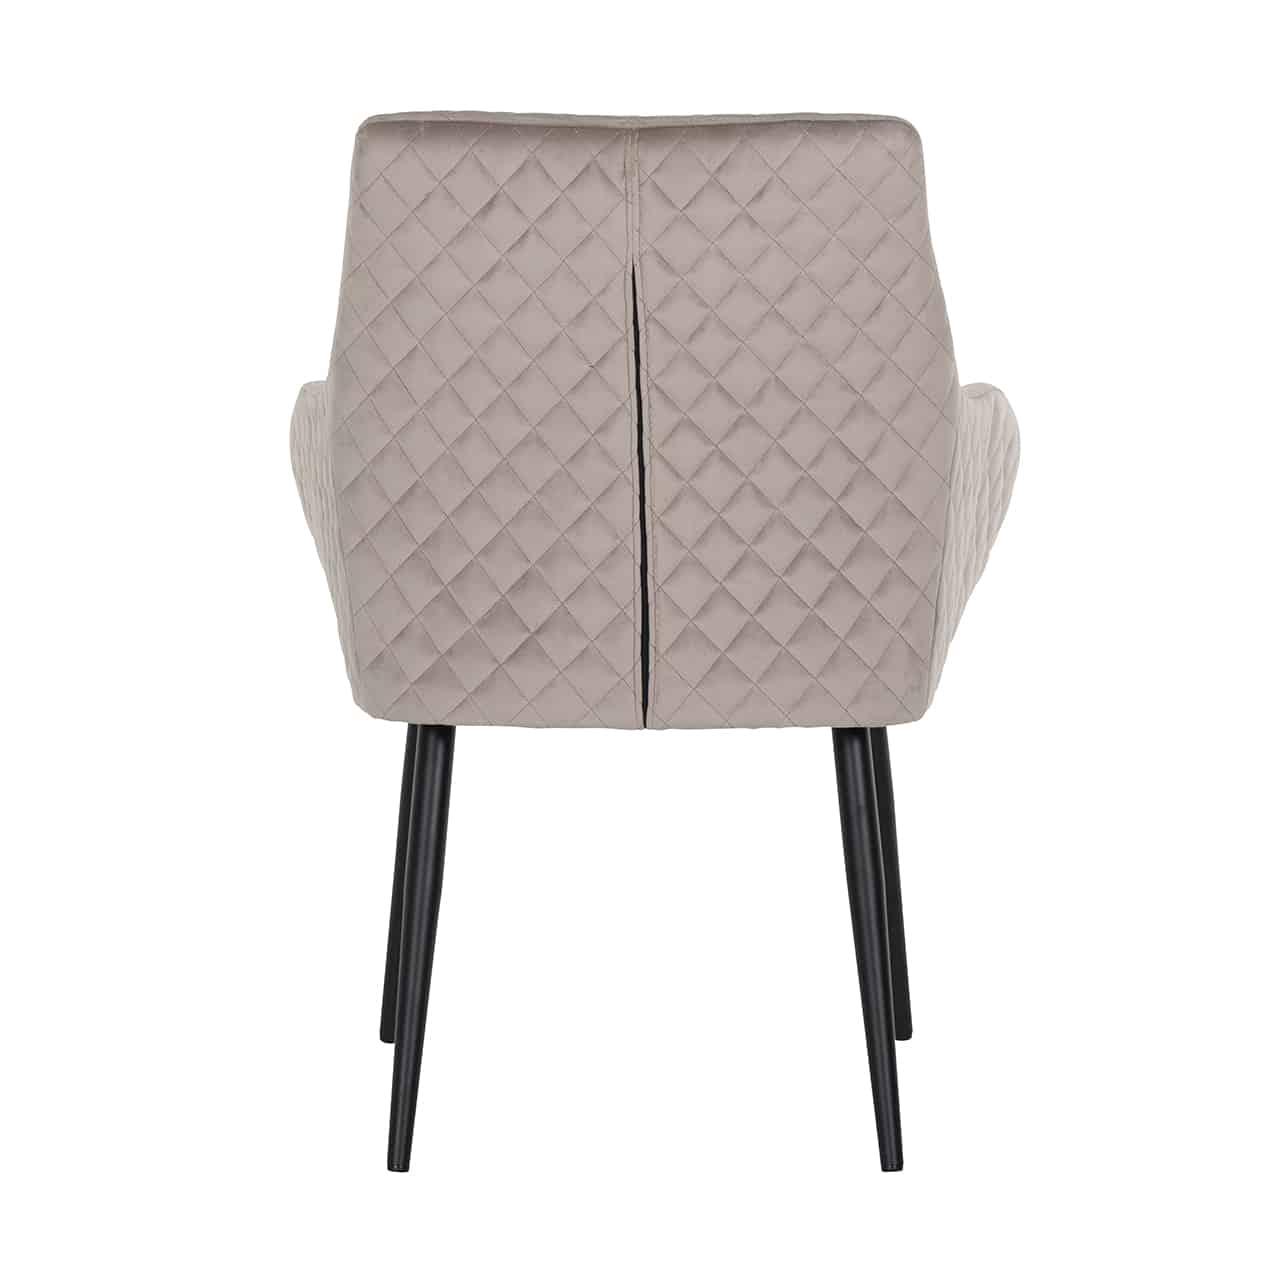 Quel Tissu Pour Chaise chaise chrissy tissu velours cuirs marron vintage richmond